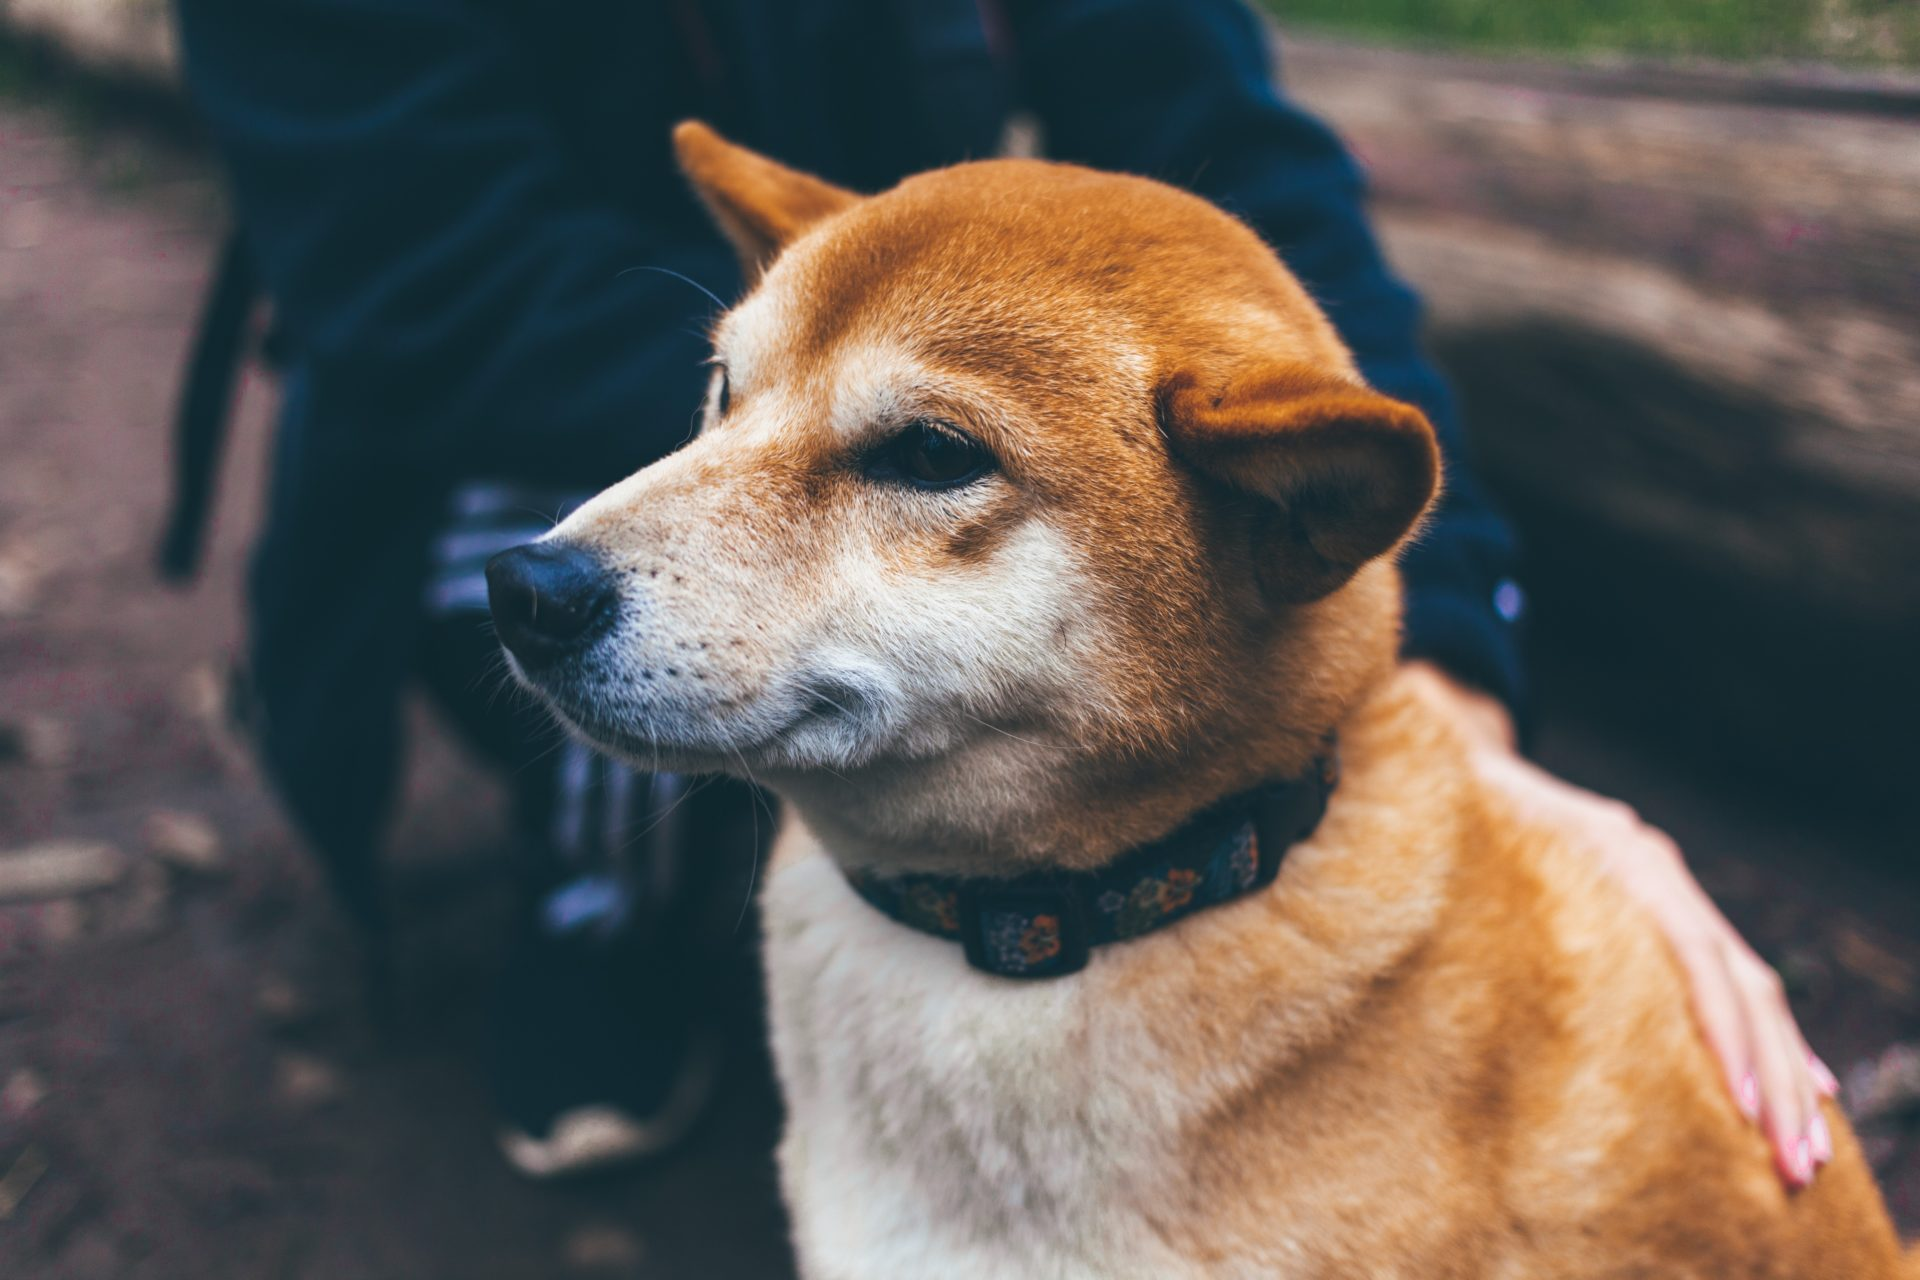 Dogecoin (DOGE) Defies Red Market, Posts Slight Gain 13